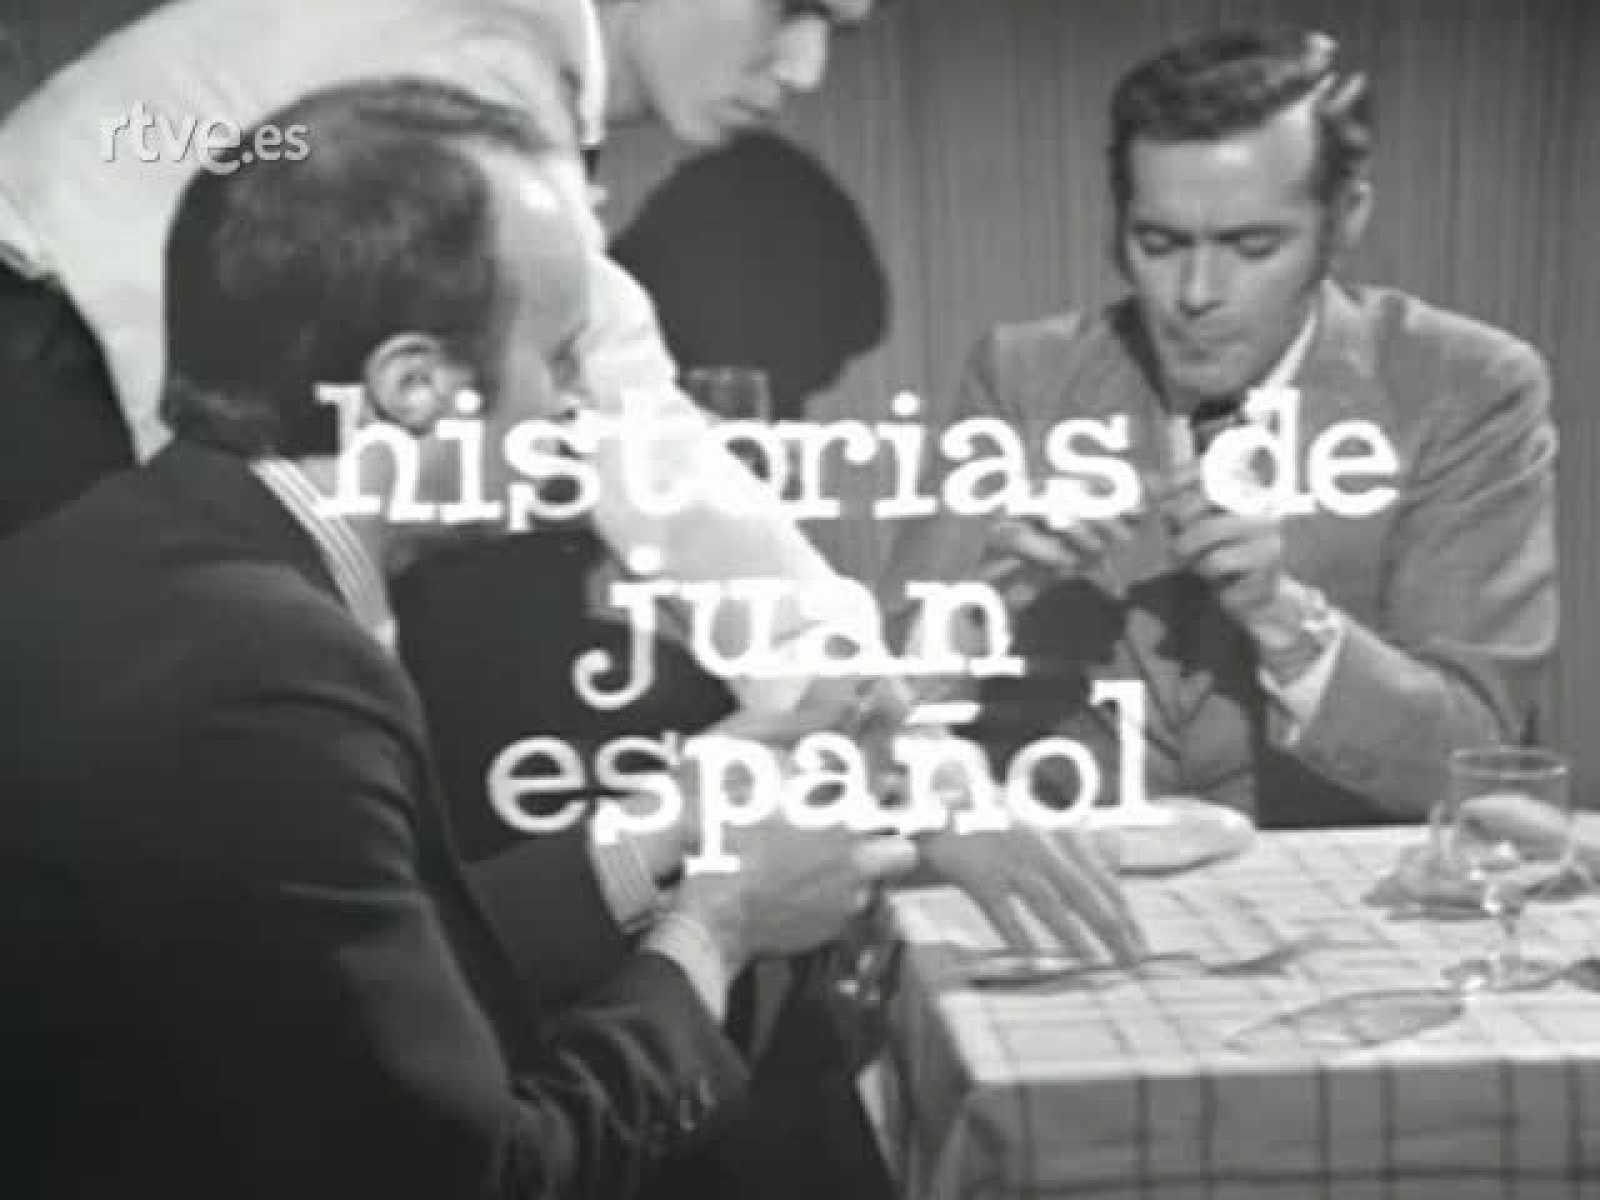 Historias de Juan Español - Visita el cabaret